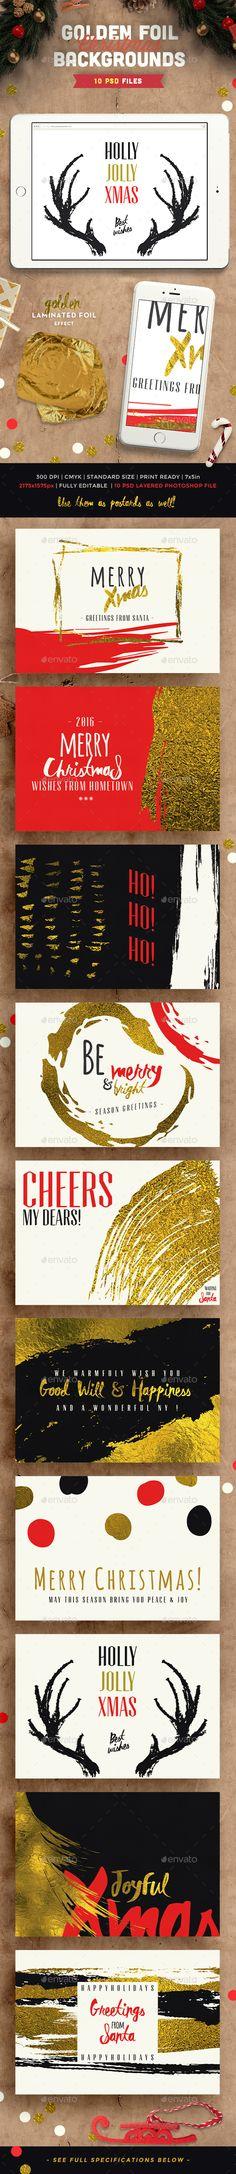 Golden Foil Christmas Backgrounds